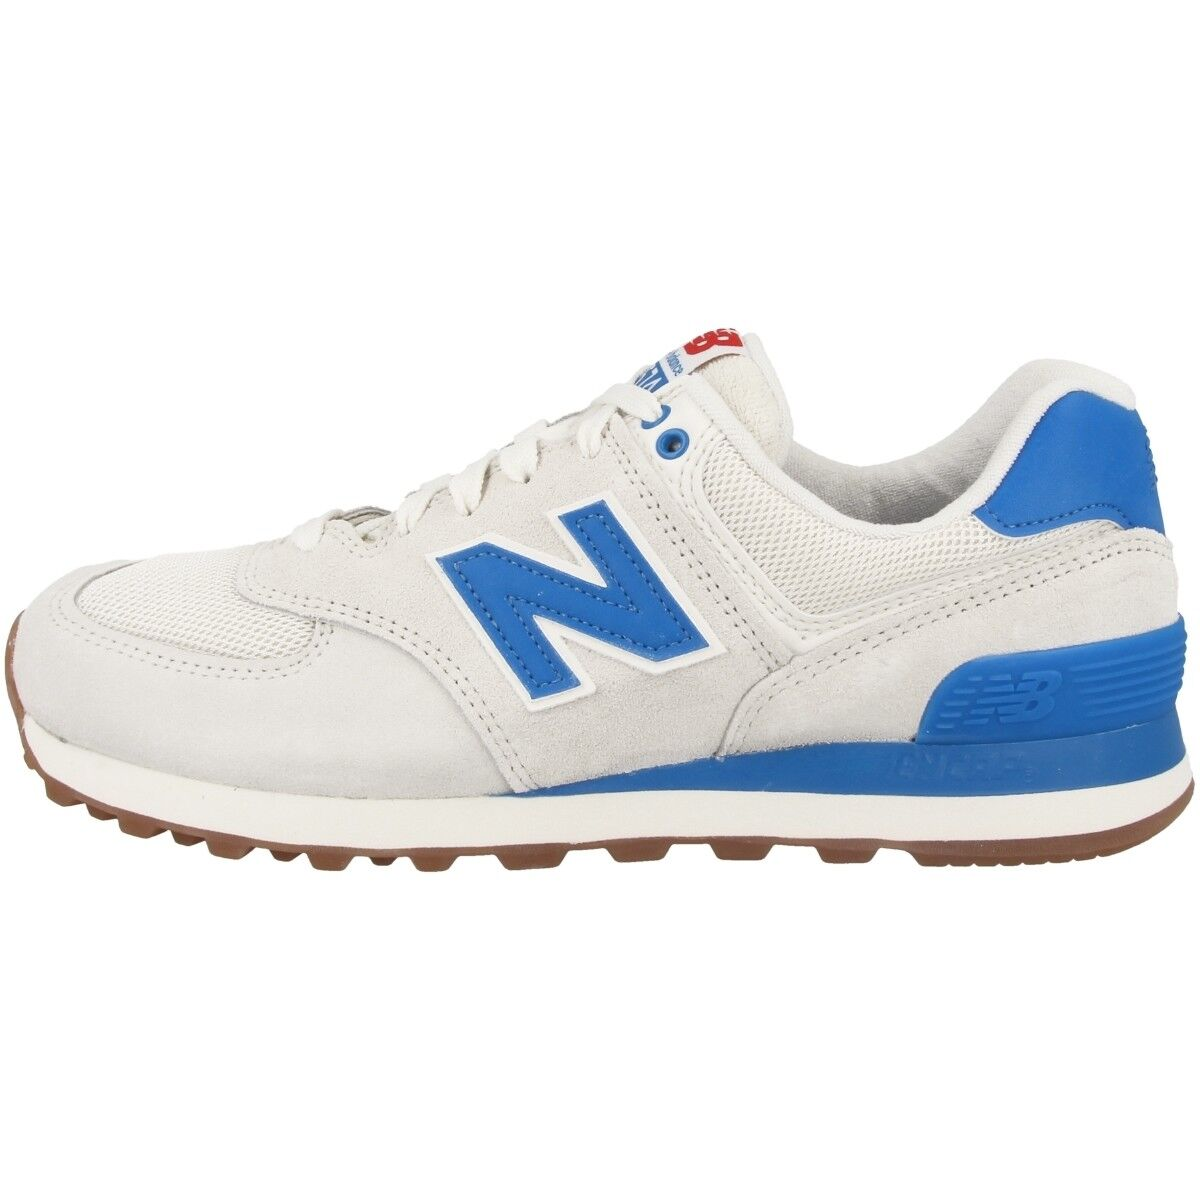 New Balance Zapatillas Mujer Calzado 574 Rsb Azul Salt Wl otrdxCshQB